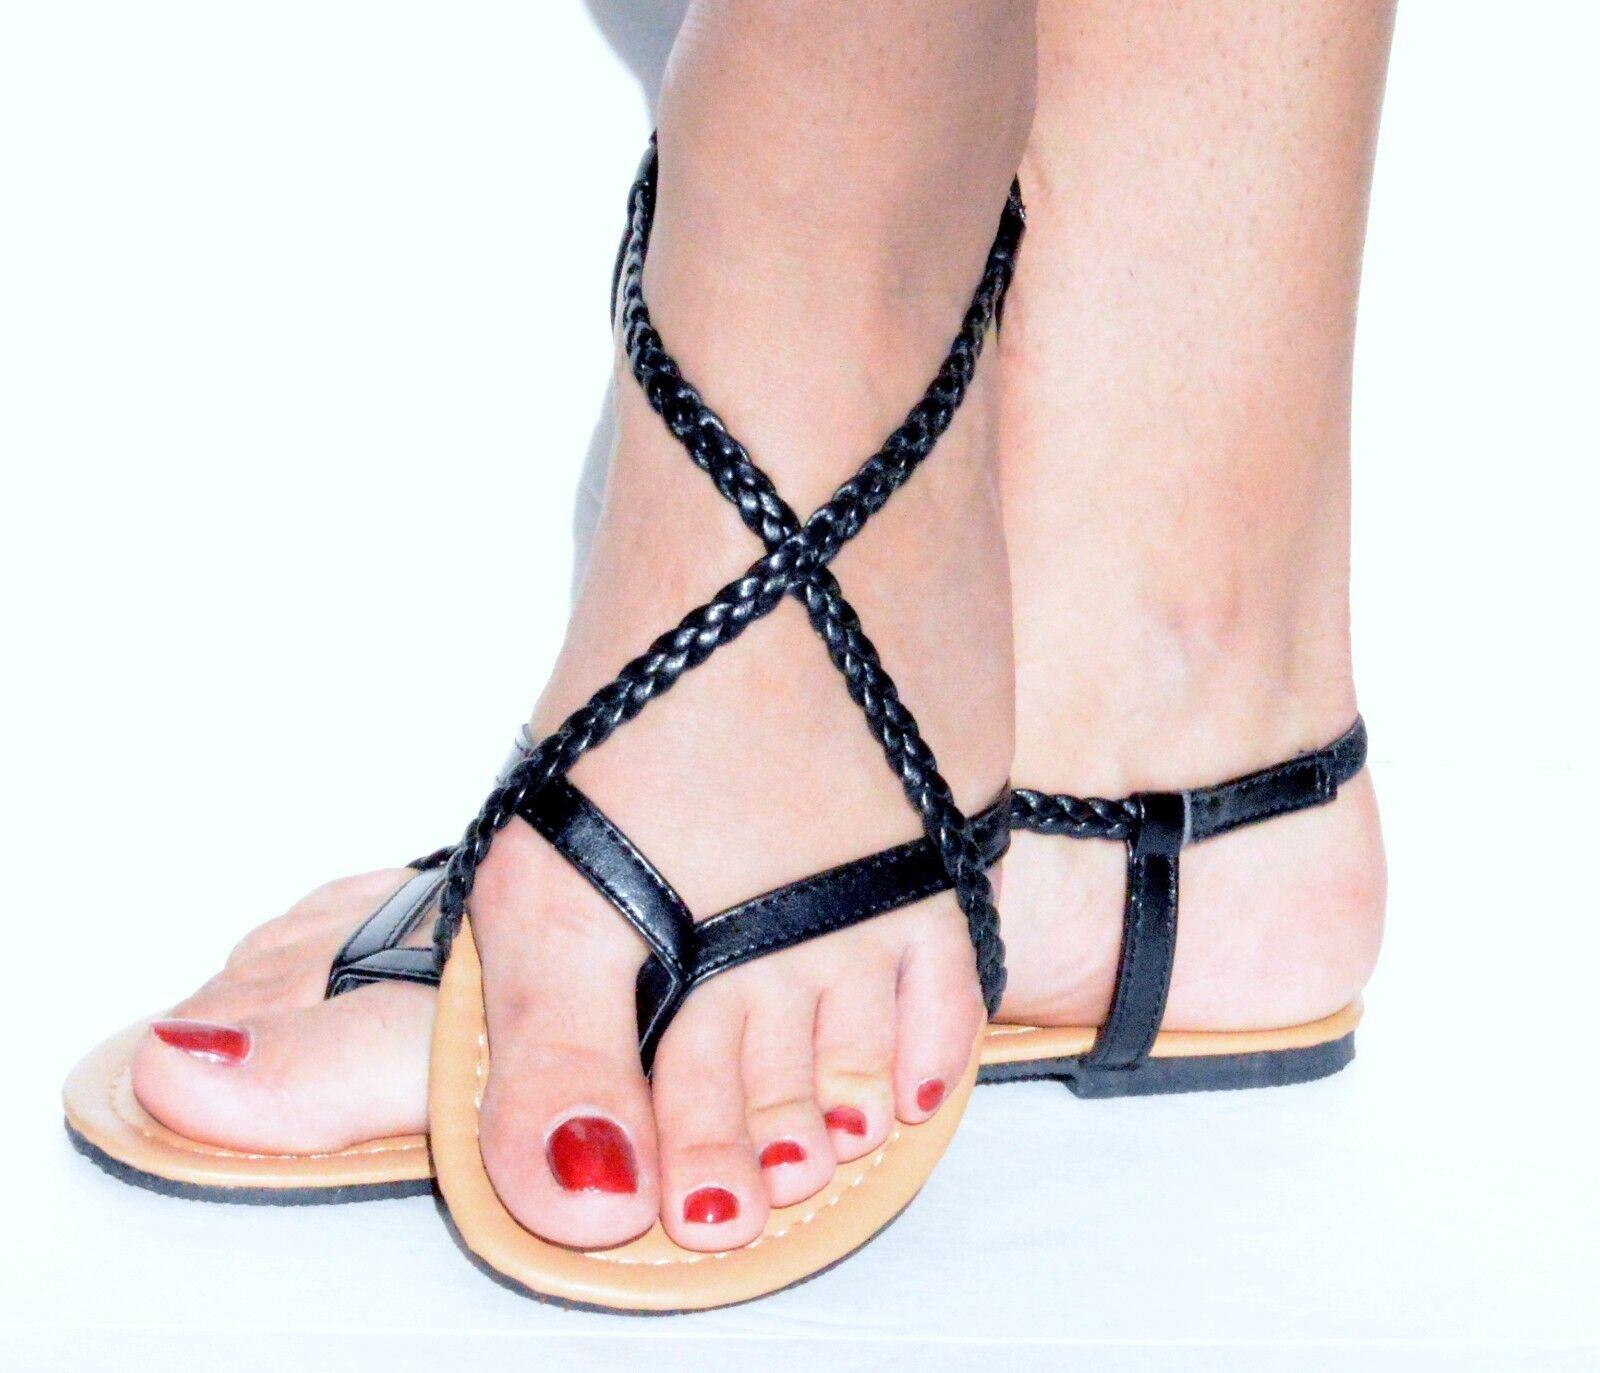 Women's Braided Gladiator Flat Sandal Y-strap Thong Flip Flops Style